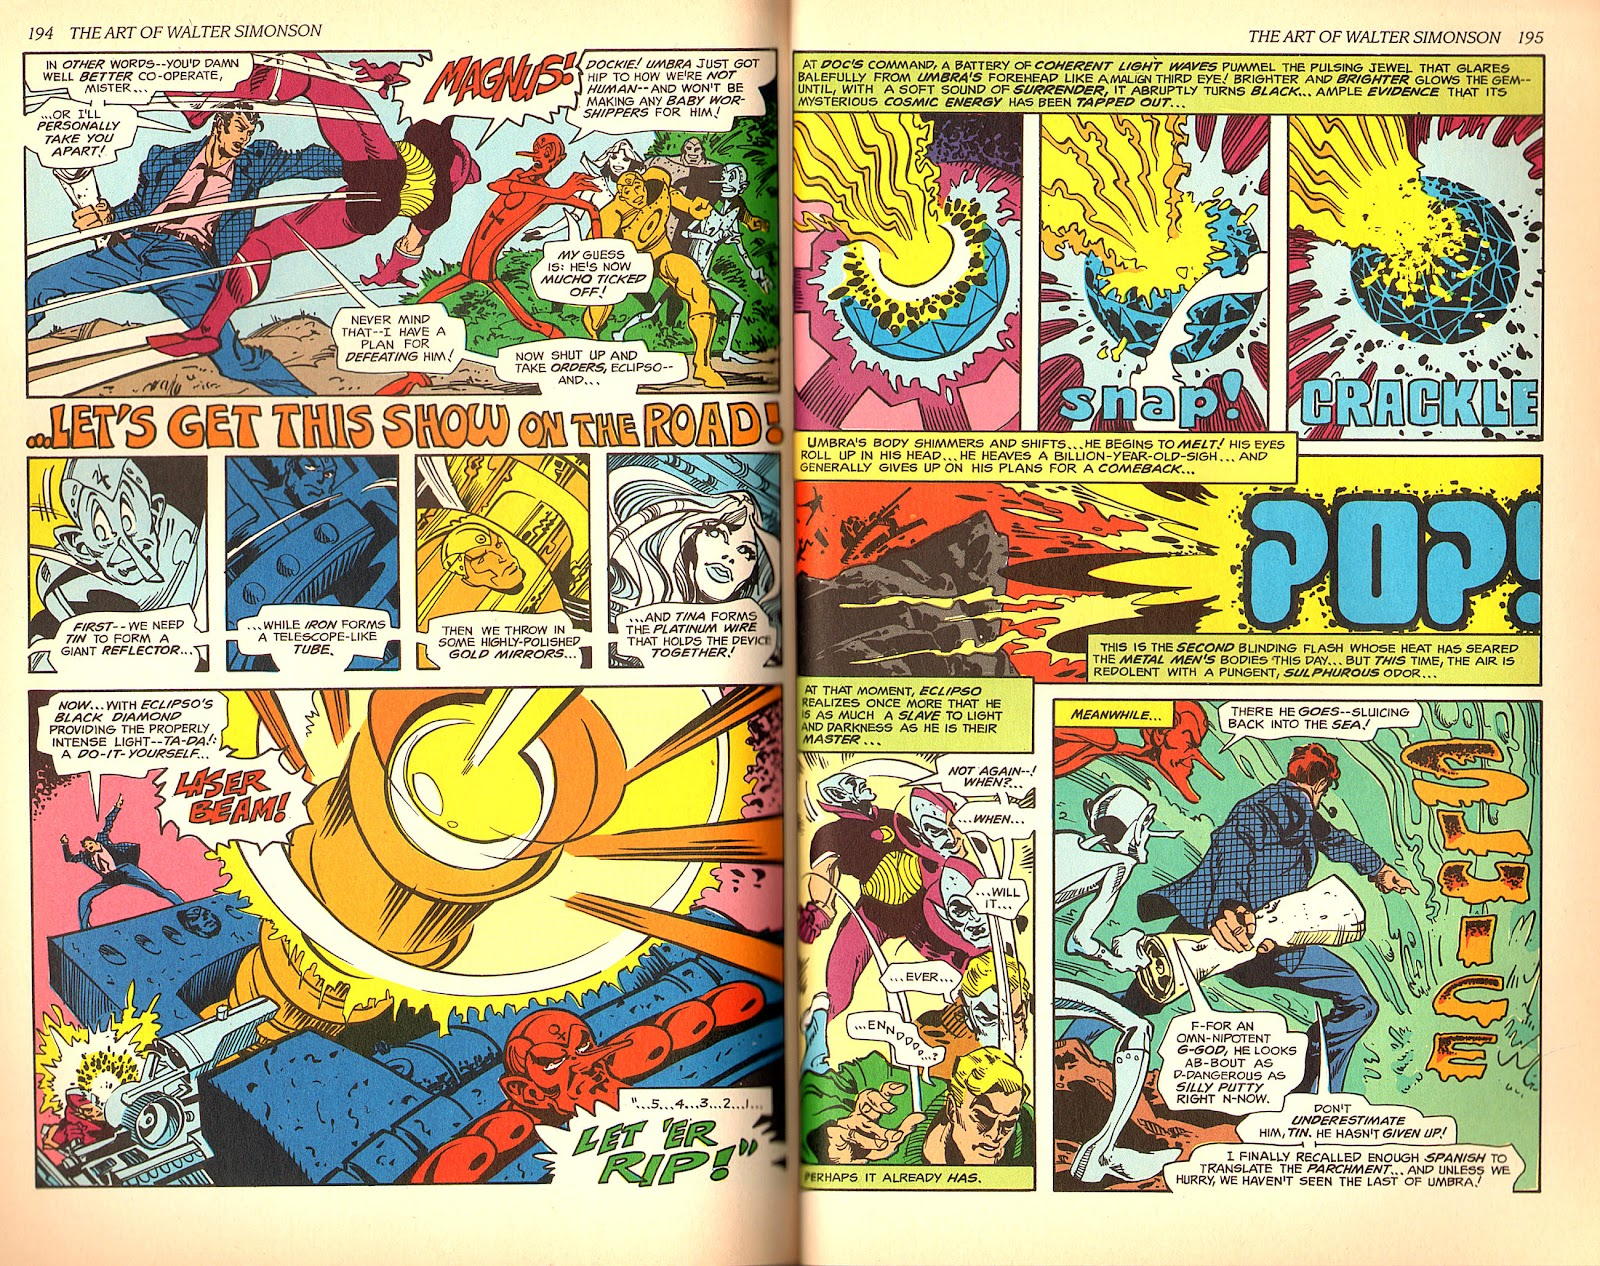 Read online The Art of Walter Simonson comic -  Issue # TPB - 99